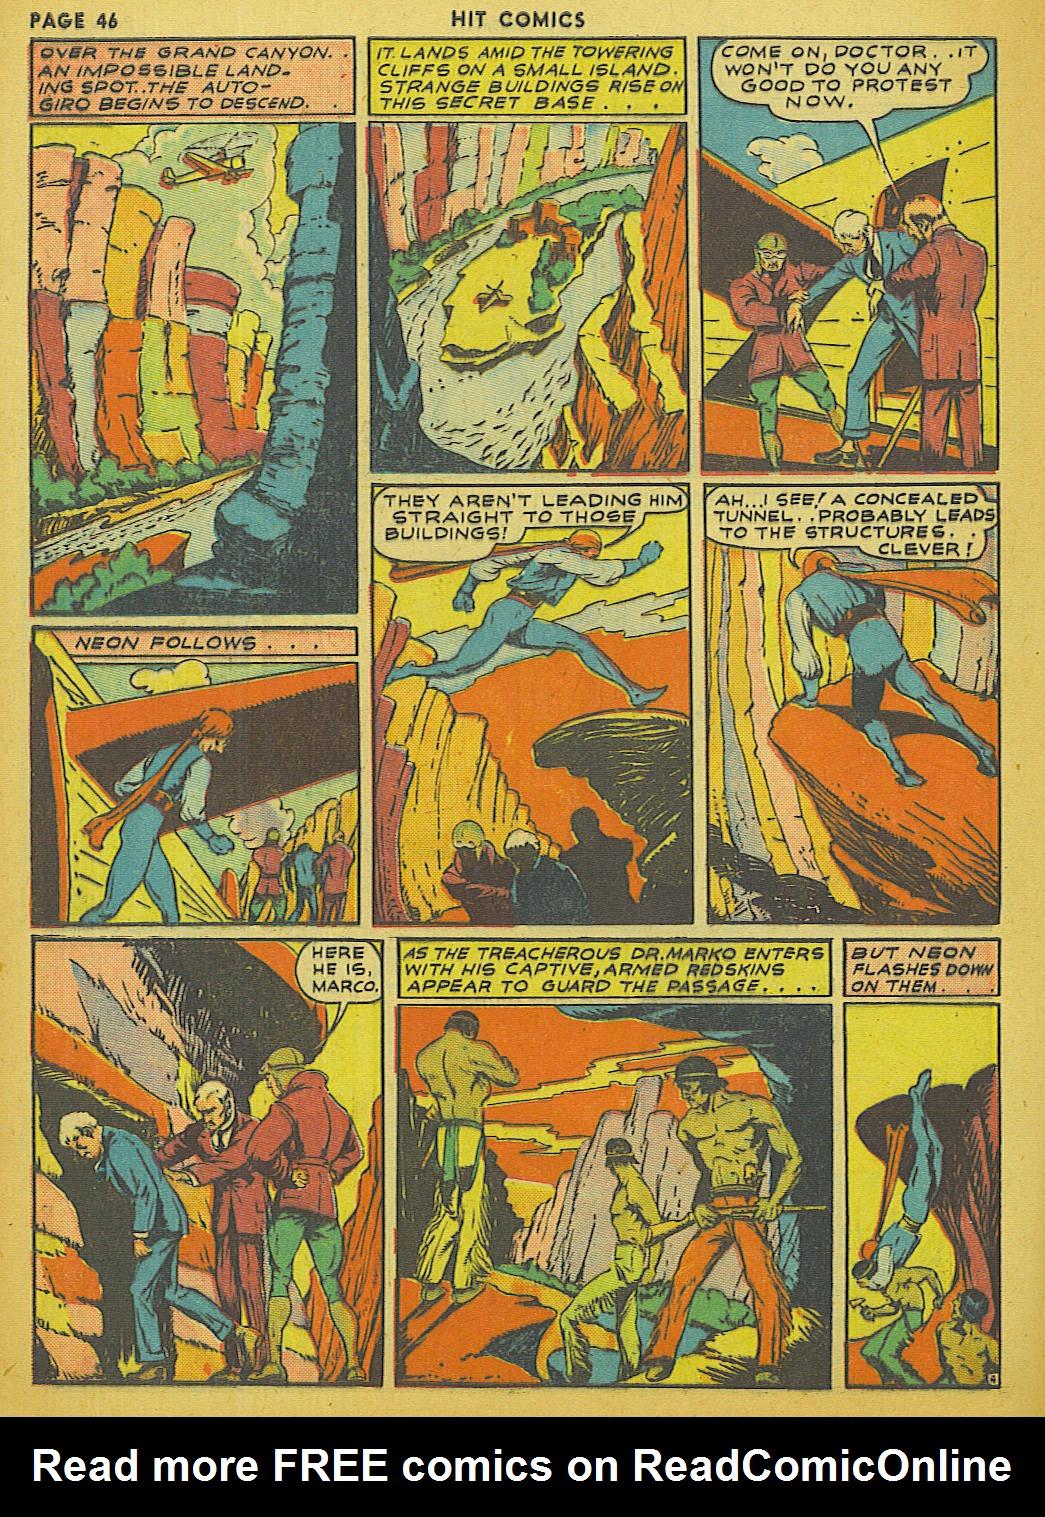 Read online Hit Comics comic -  Issue #13 - 48